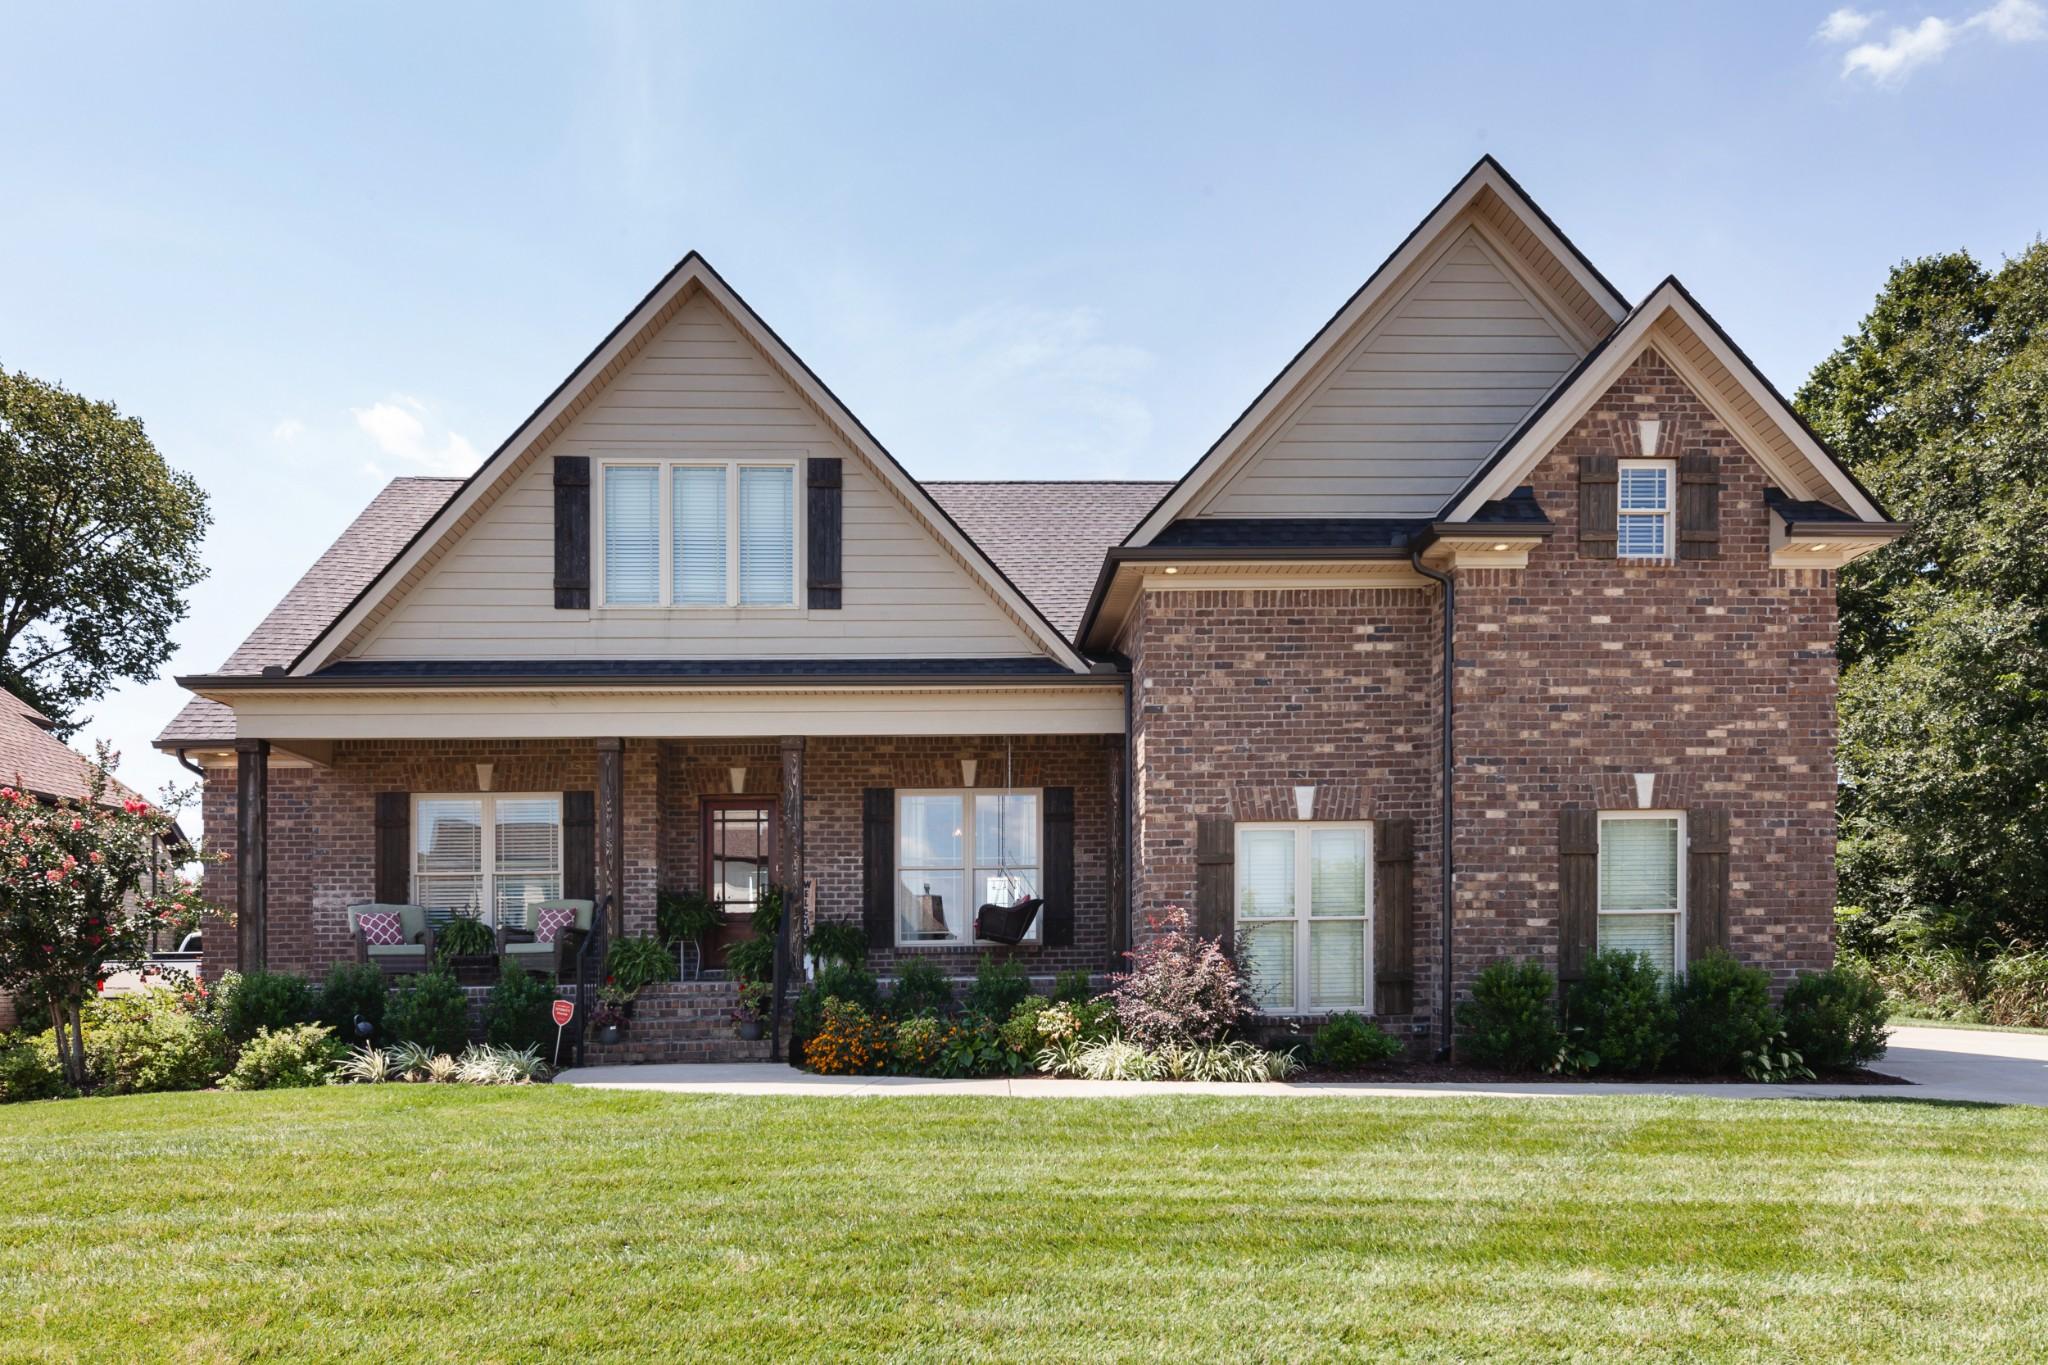 231 Pheasant Run Trail Property Photo - Murfreesboro, TN real estate listing